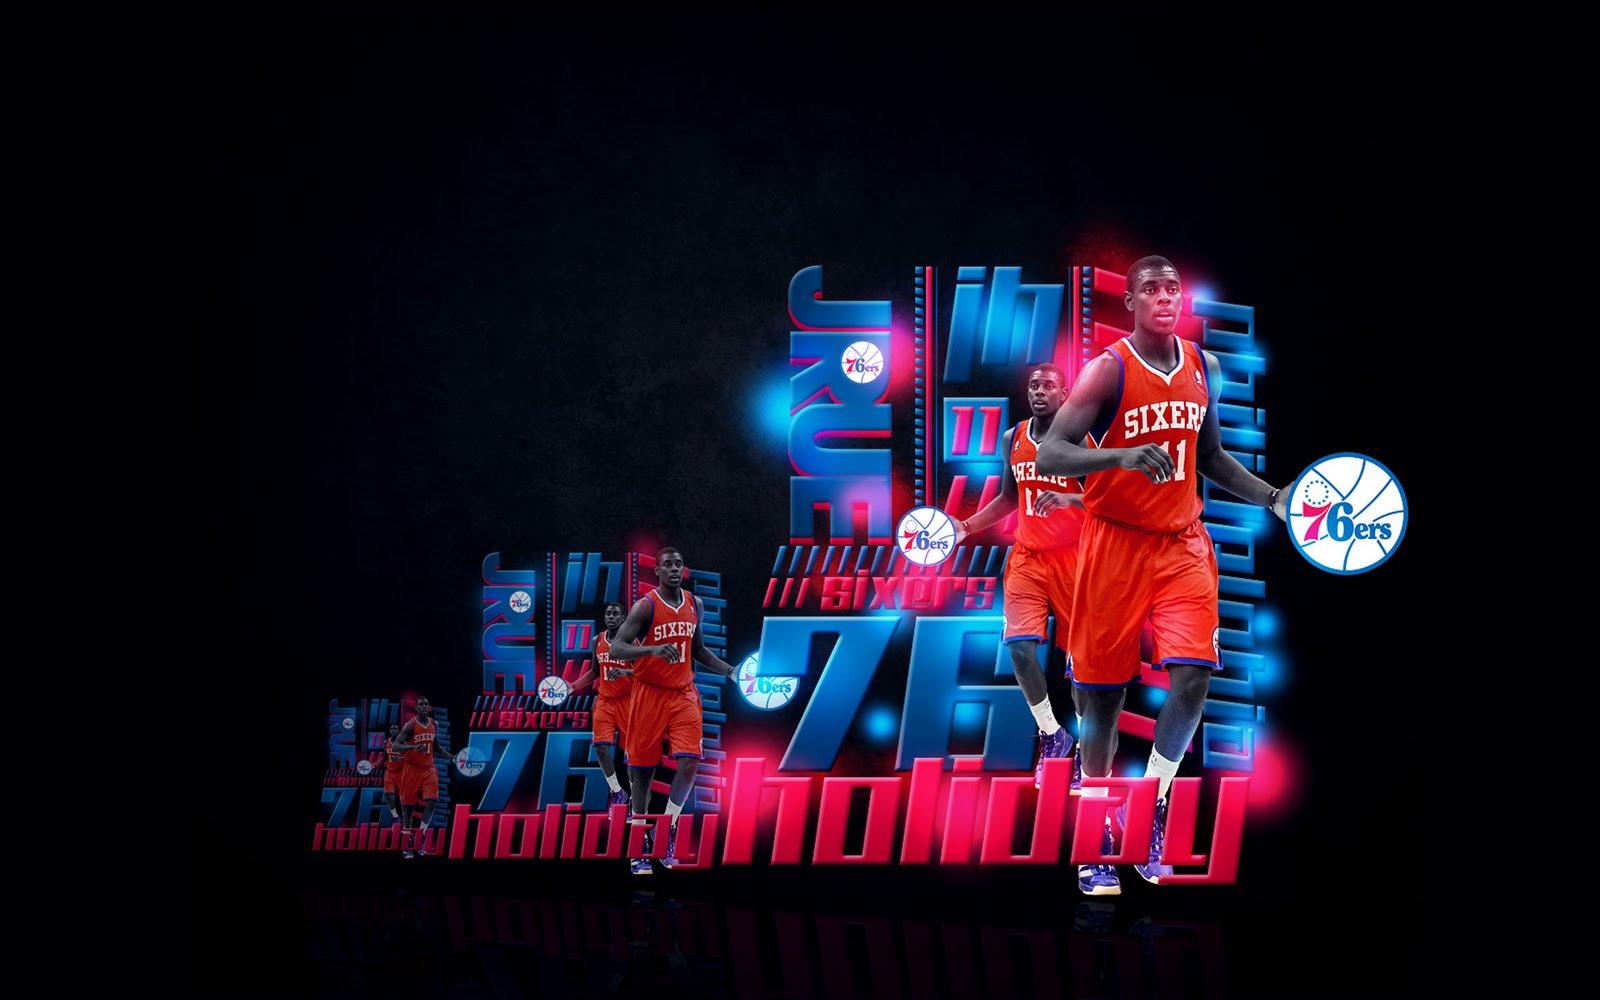 jrue holiday philadelphia 76ers widescreen wallpaper big